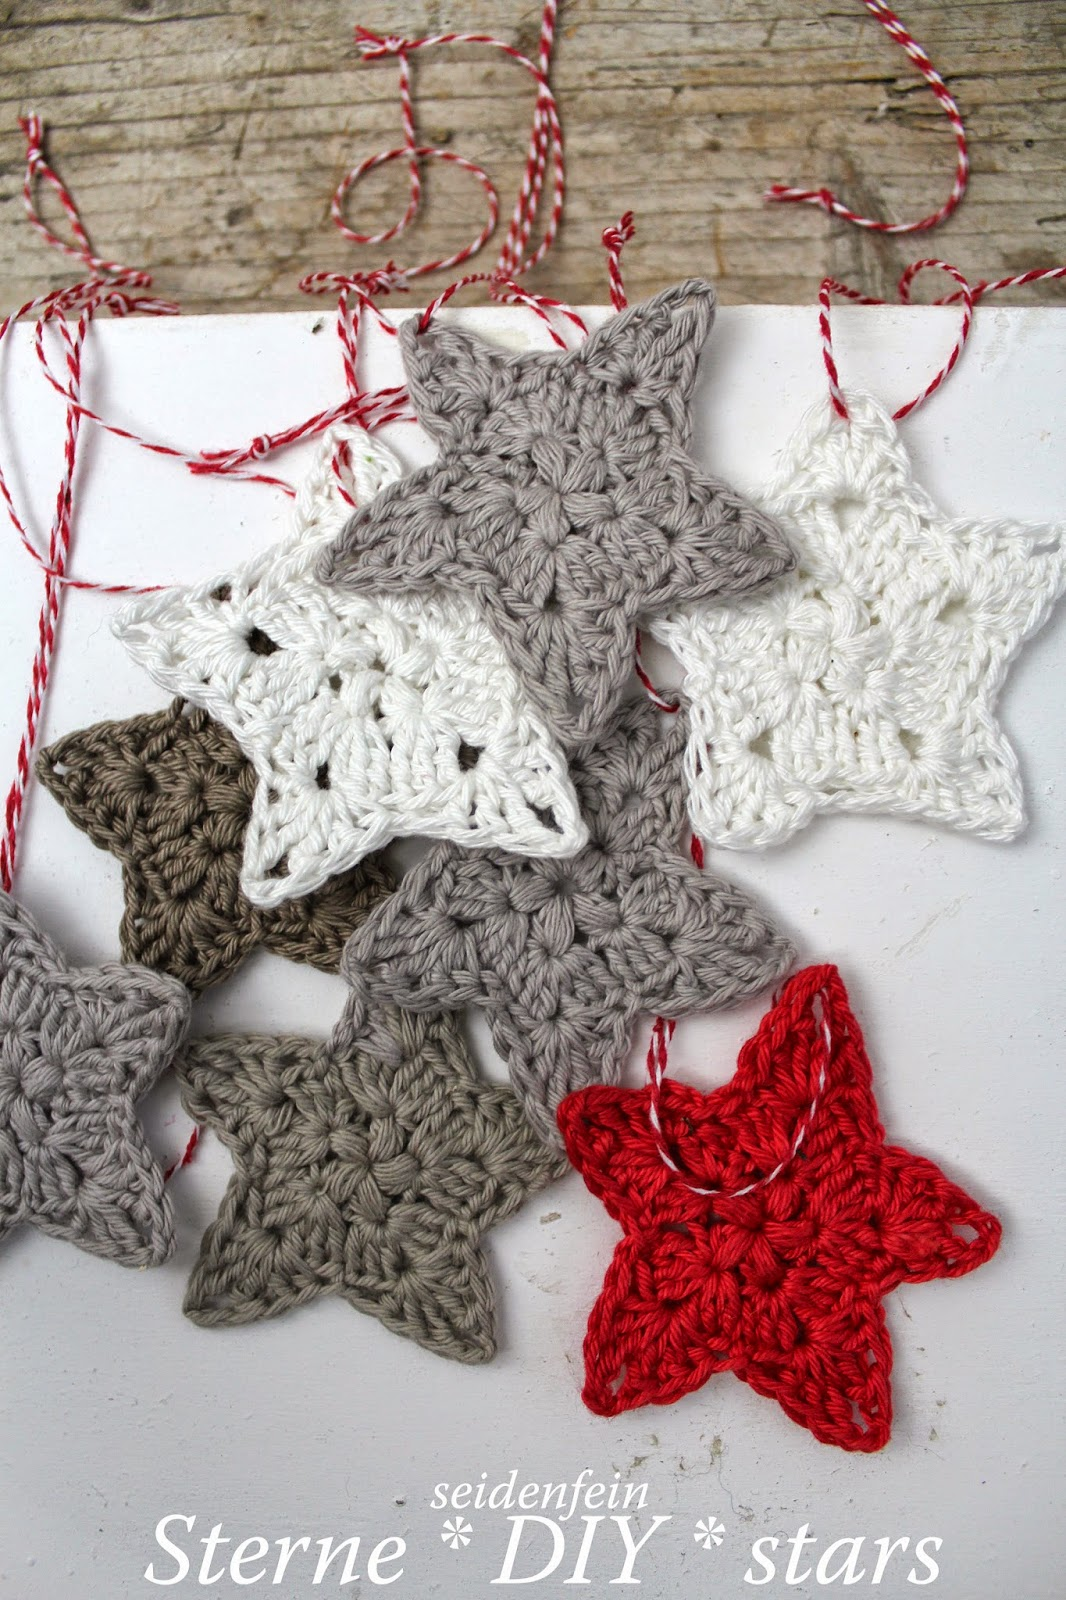 seidenfeins blog vom sch nen landleben 11 sternchen anh nger diy crochet some stars. Black Bedroom Furniture Sets. Home Design Ideas